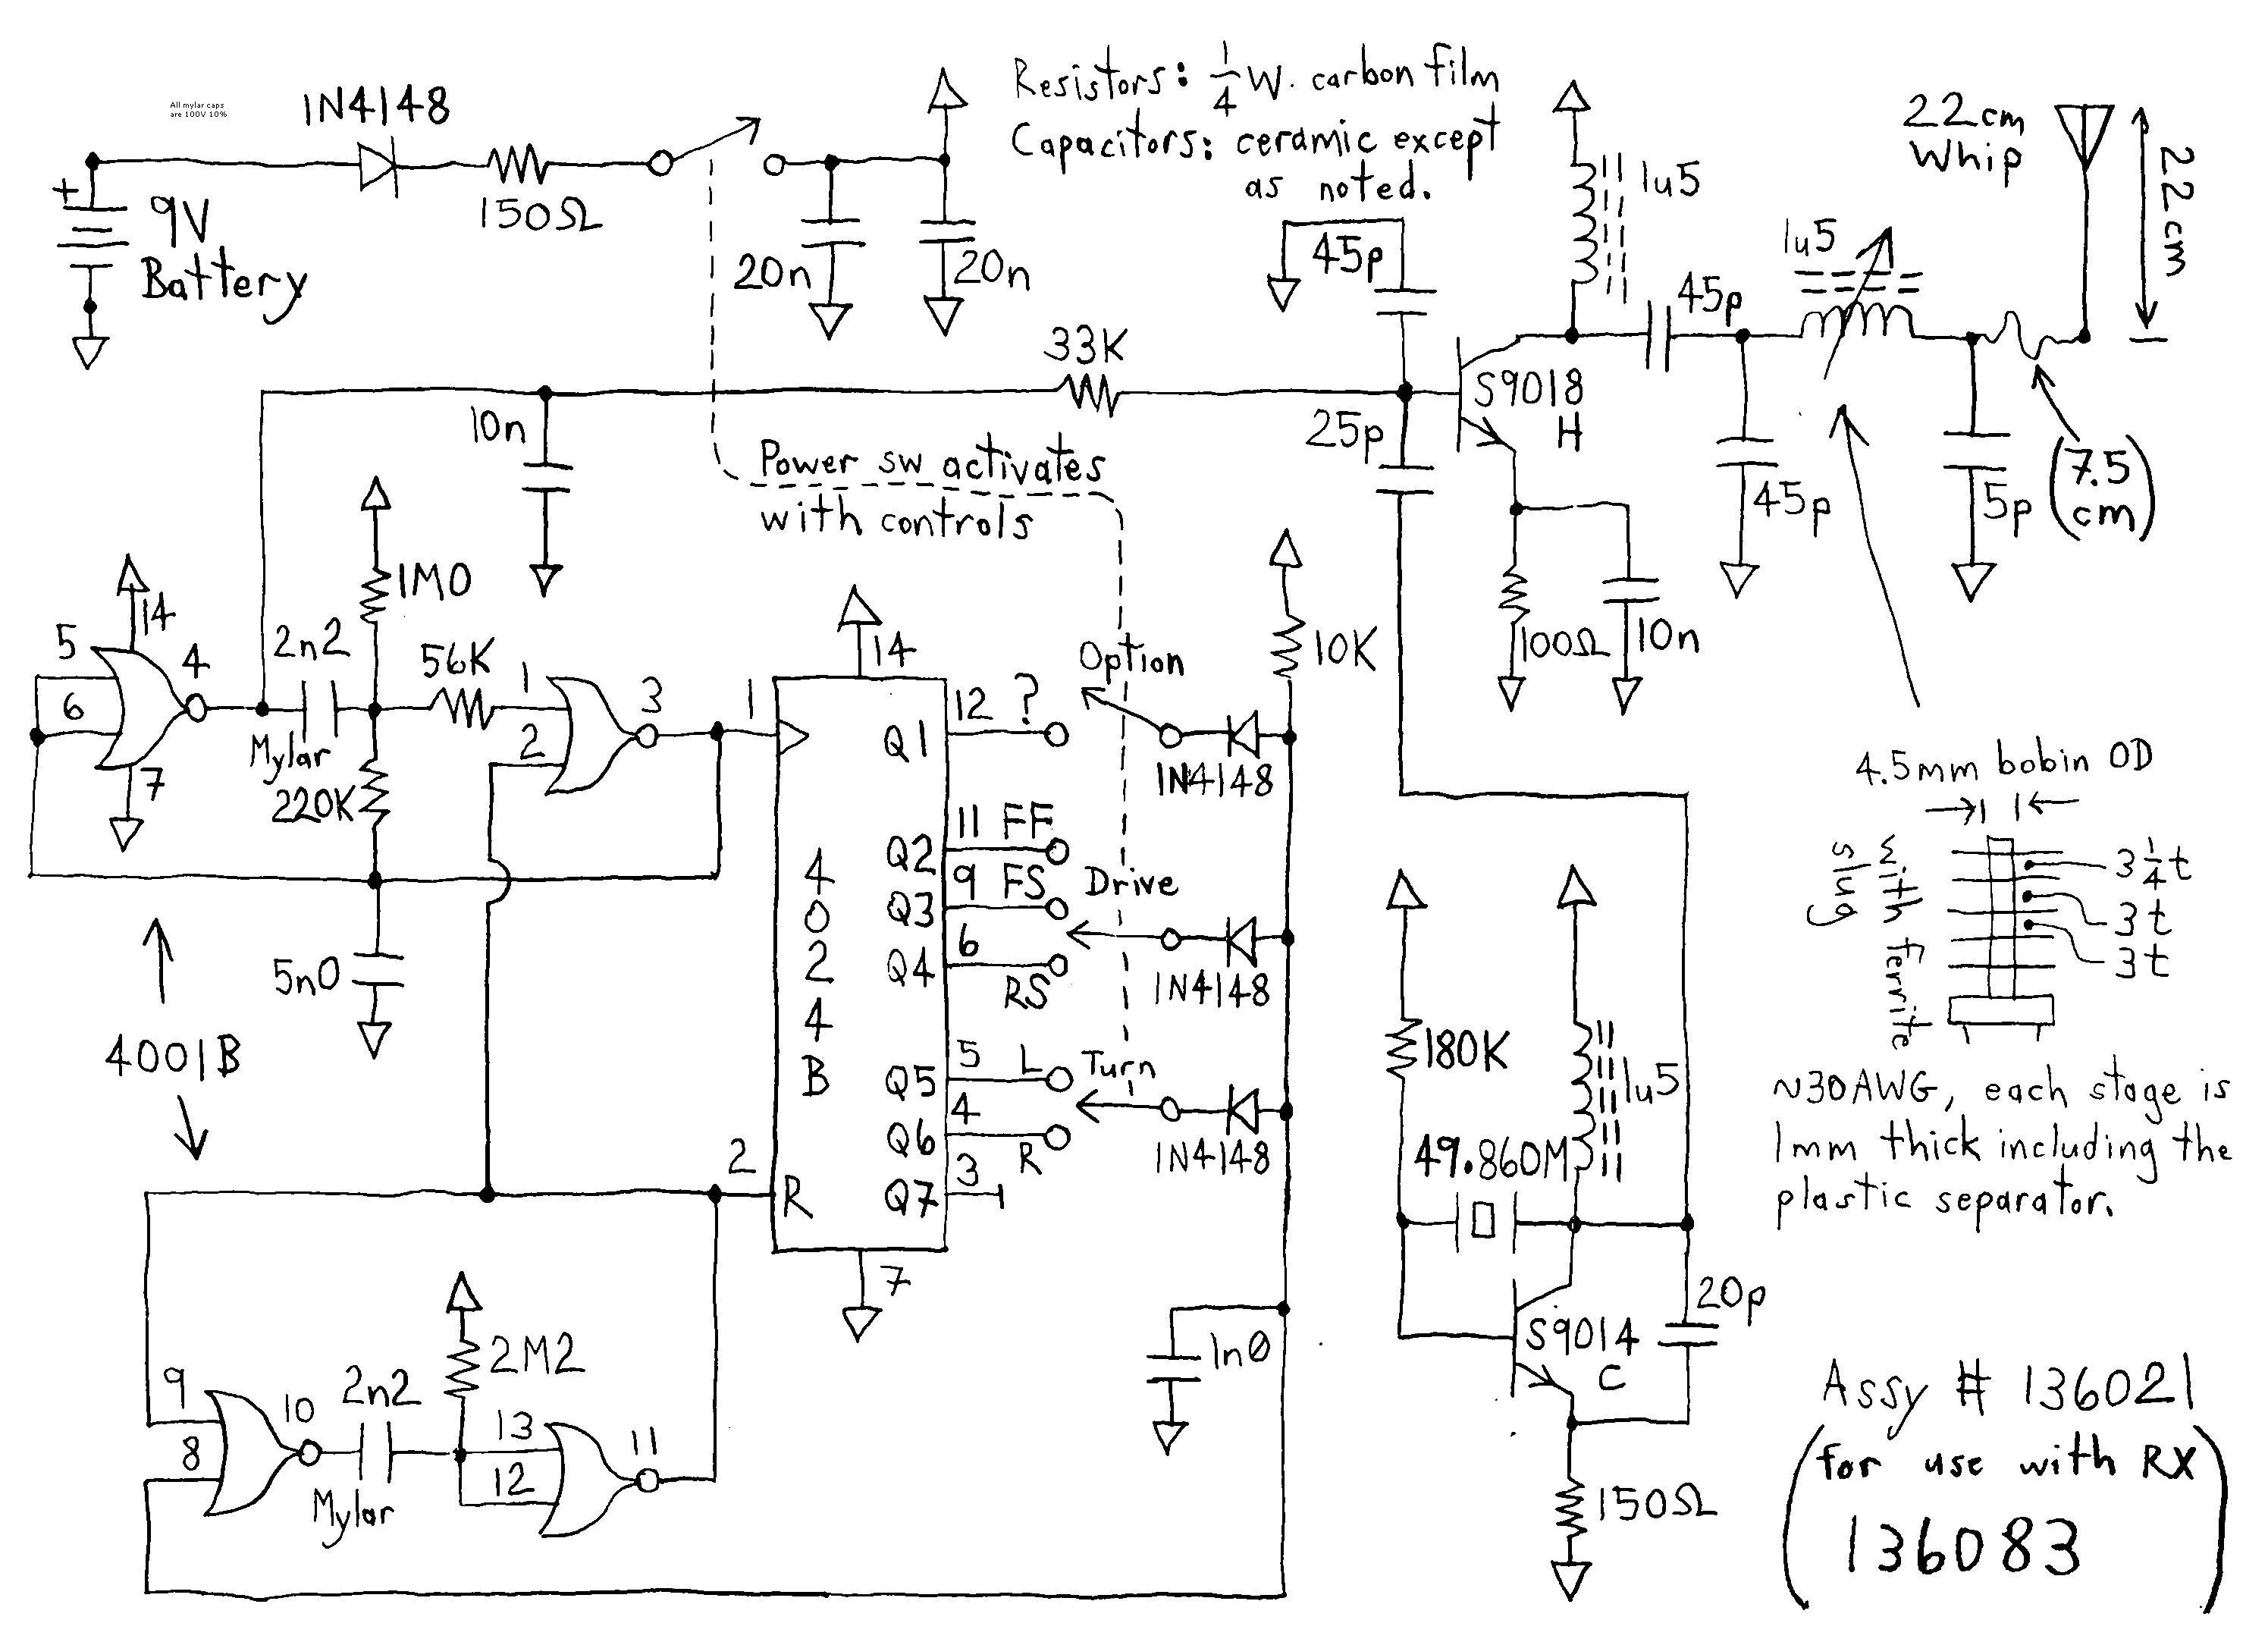 Car Amplifier Circuit Diagram Multiple Amplifier Wiring Diagram Best Amp Wiring Diagram Car Of Car Amplifier Circuit Diagram